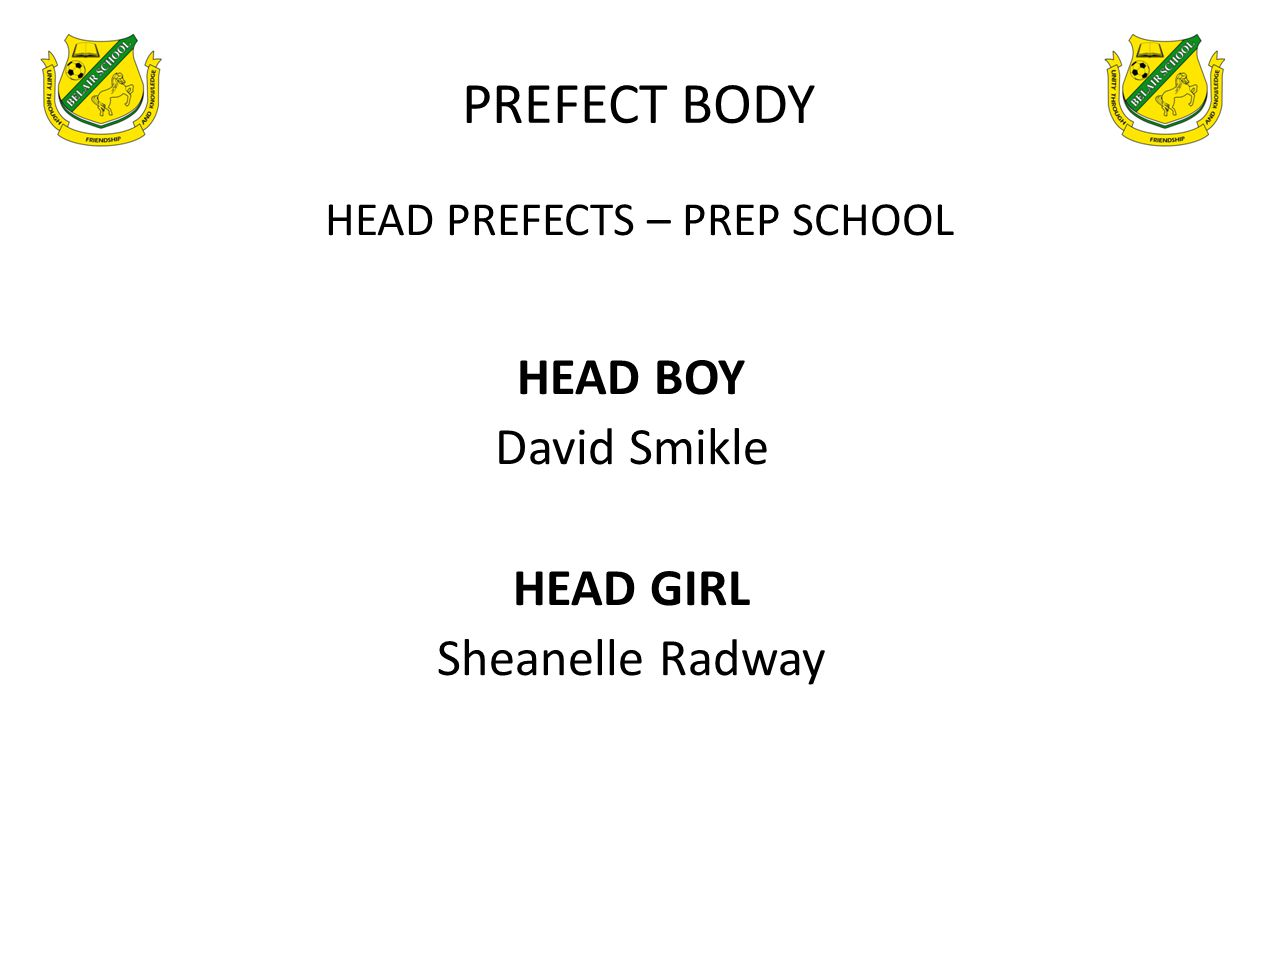 HEAD PREFECTS – PREP SCHOOL